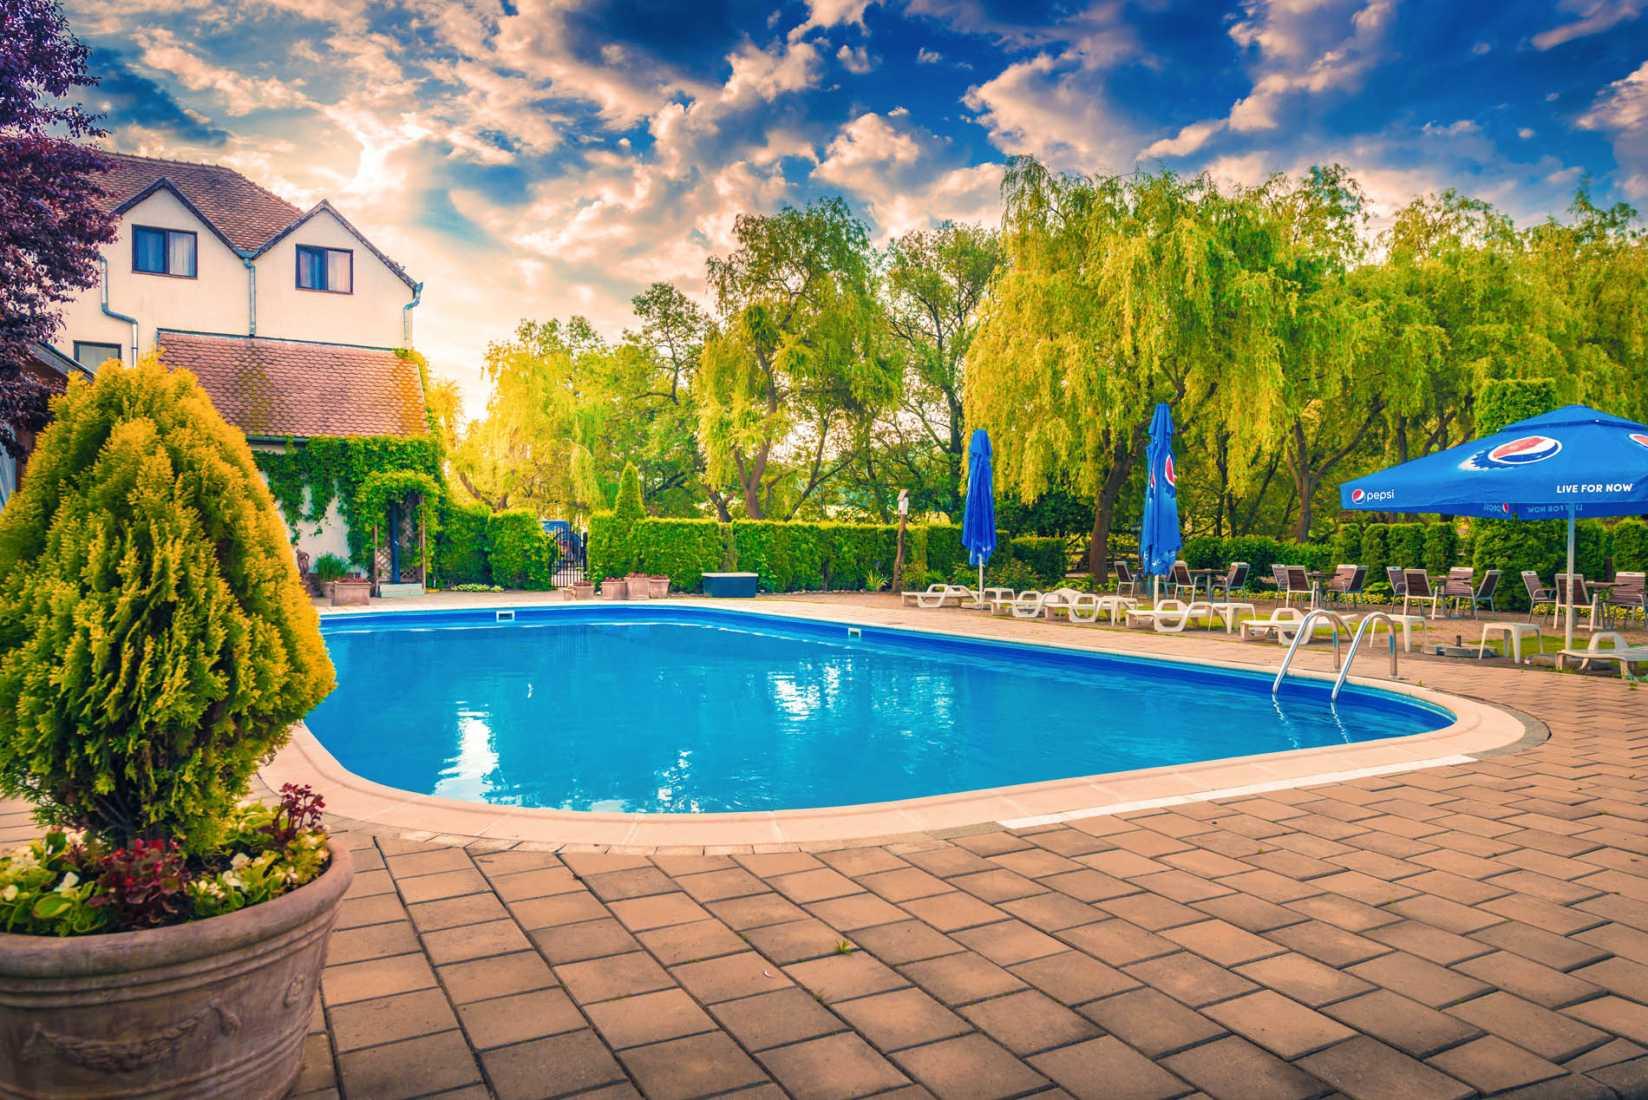 Domeniul dracula dane for Cazare bran cu piscina